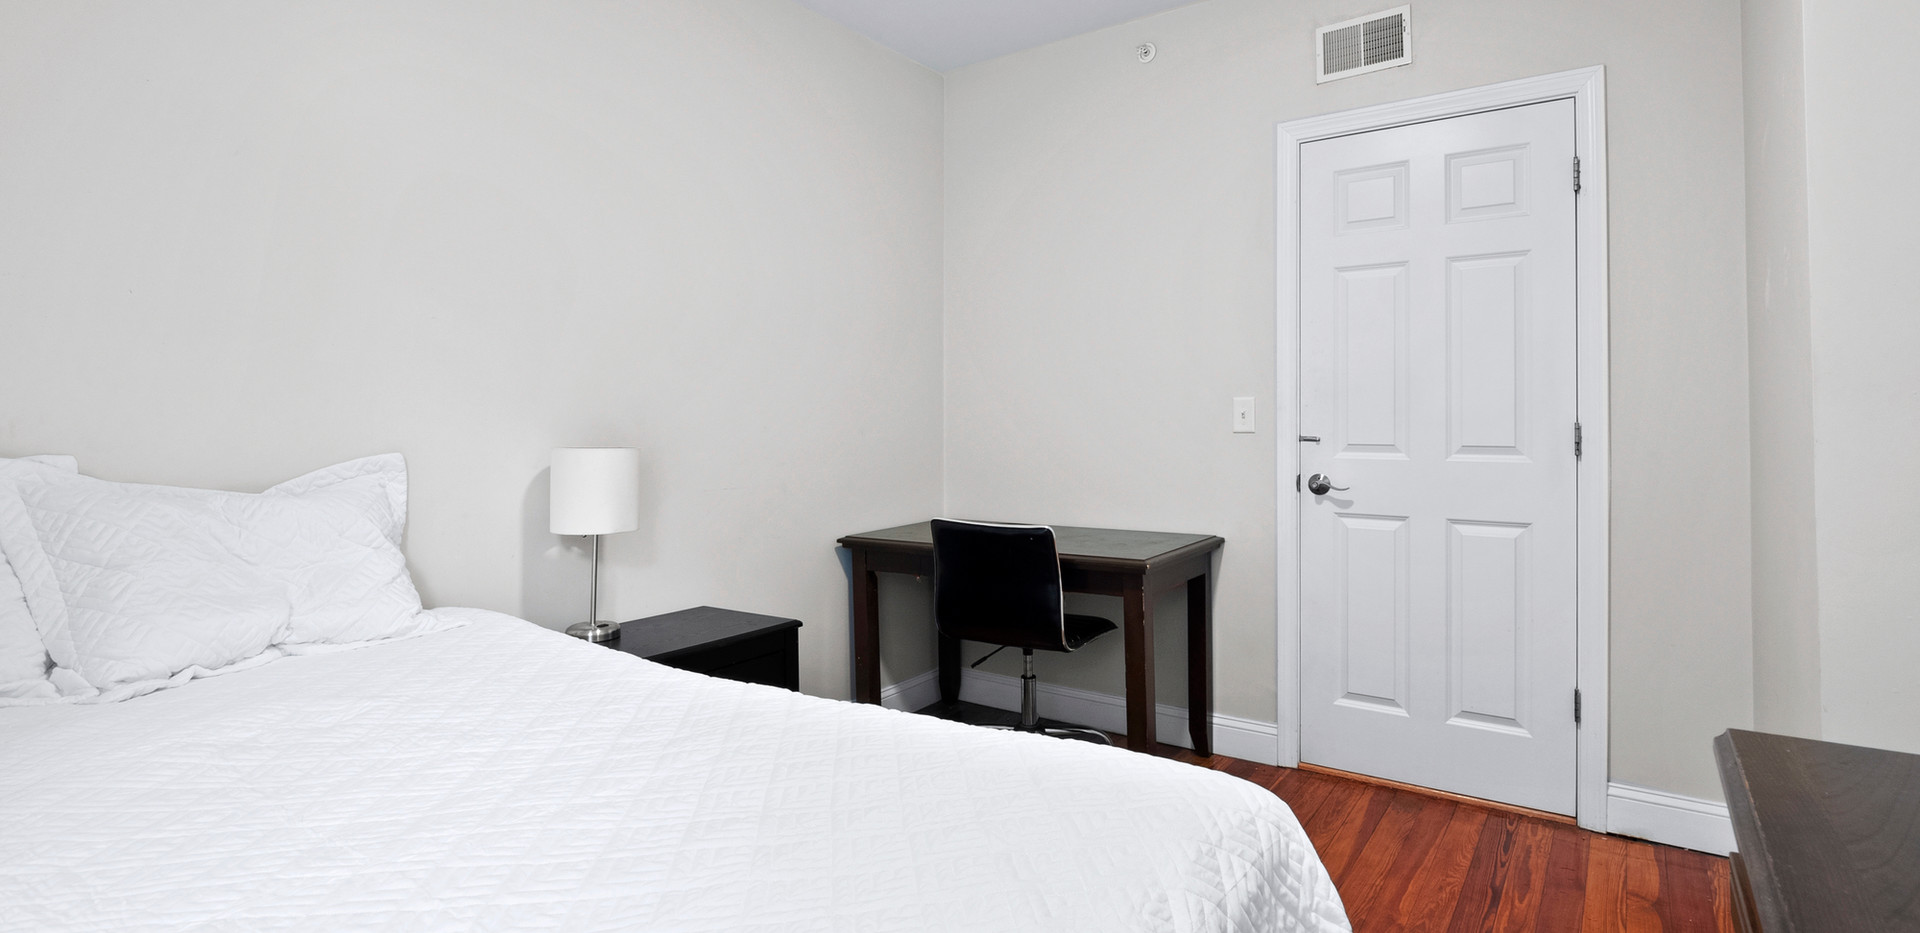 Prospect_2_Bedroom_C_Photo2.jpg